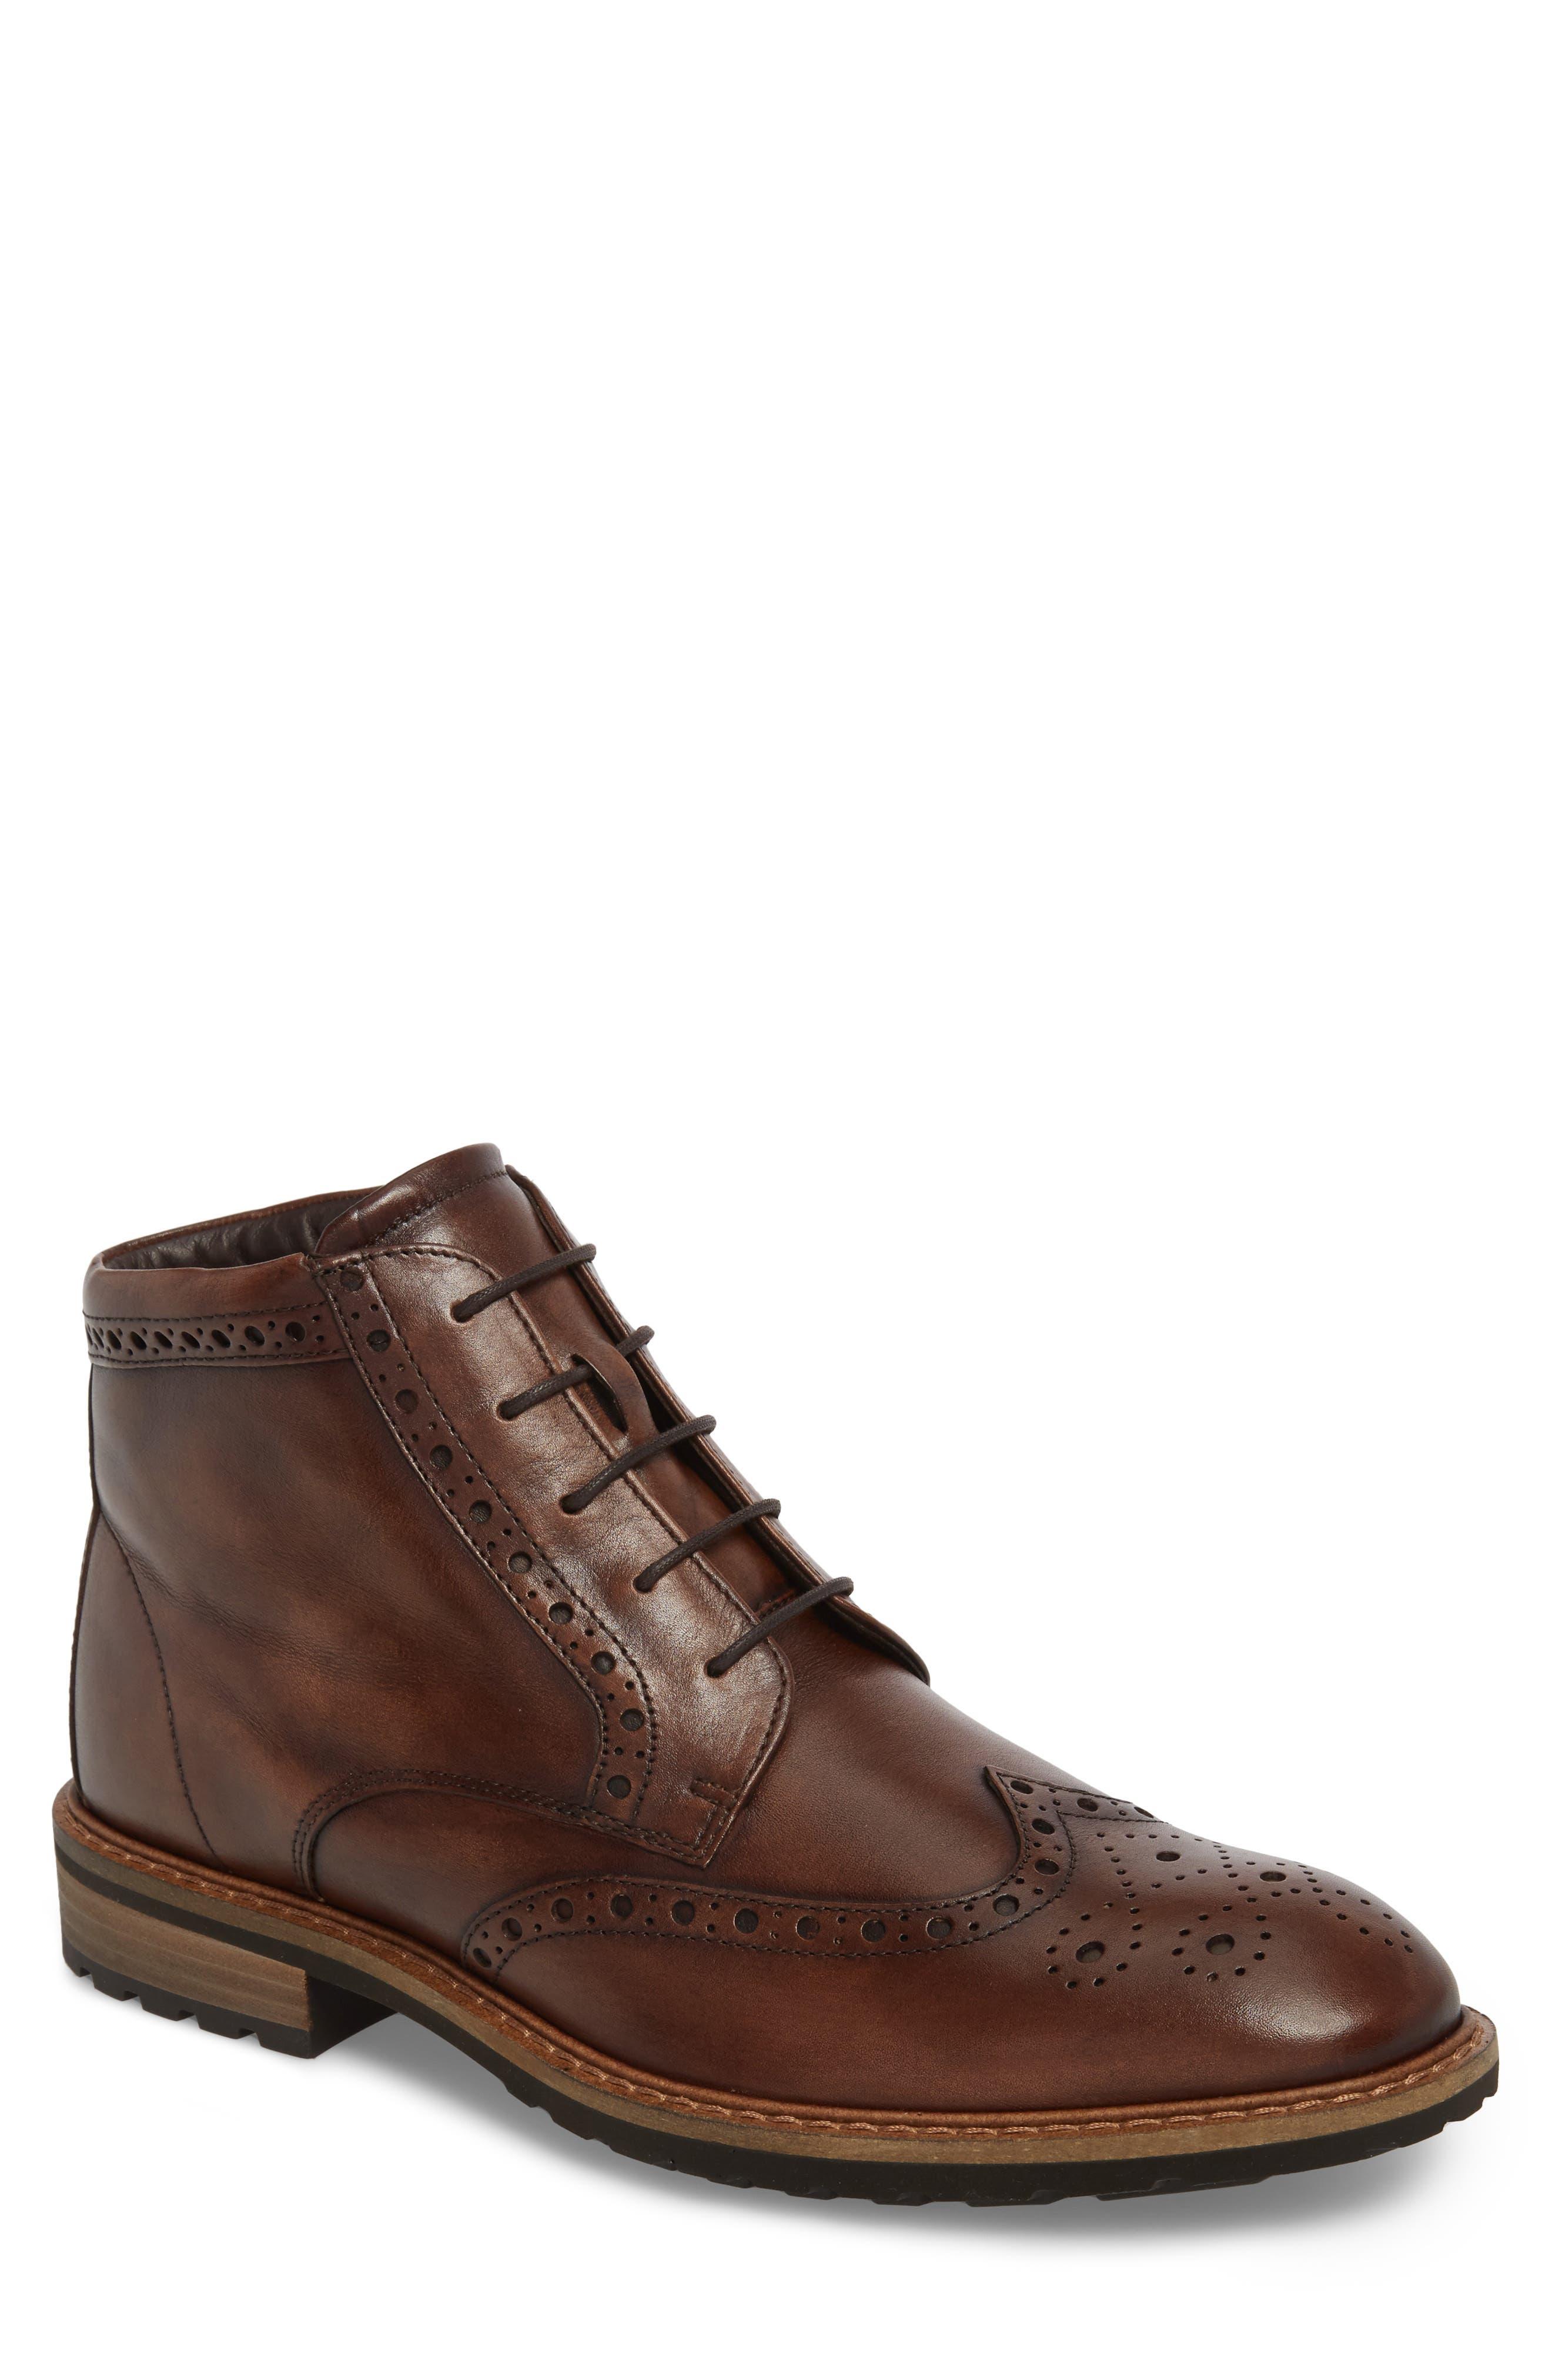 Vitrus I Wingtip Boot,                         Main,                         color, Nature Leather